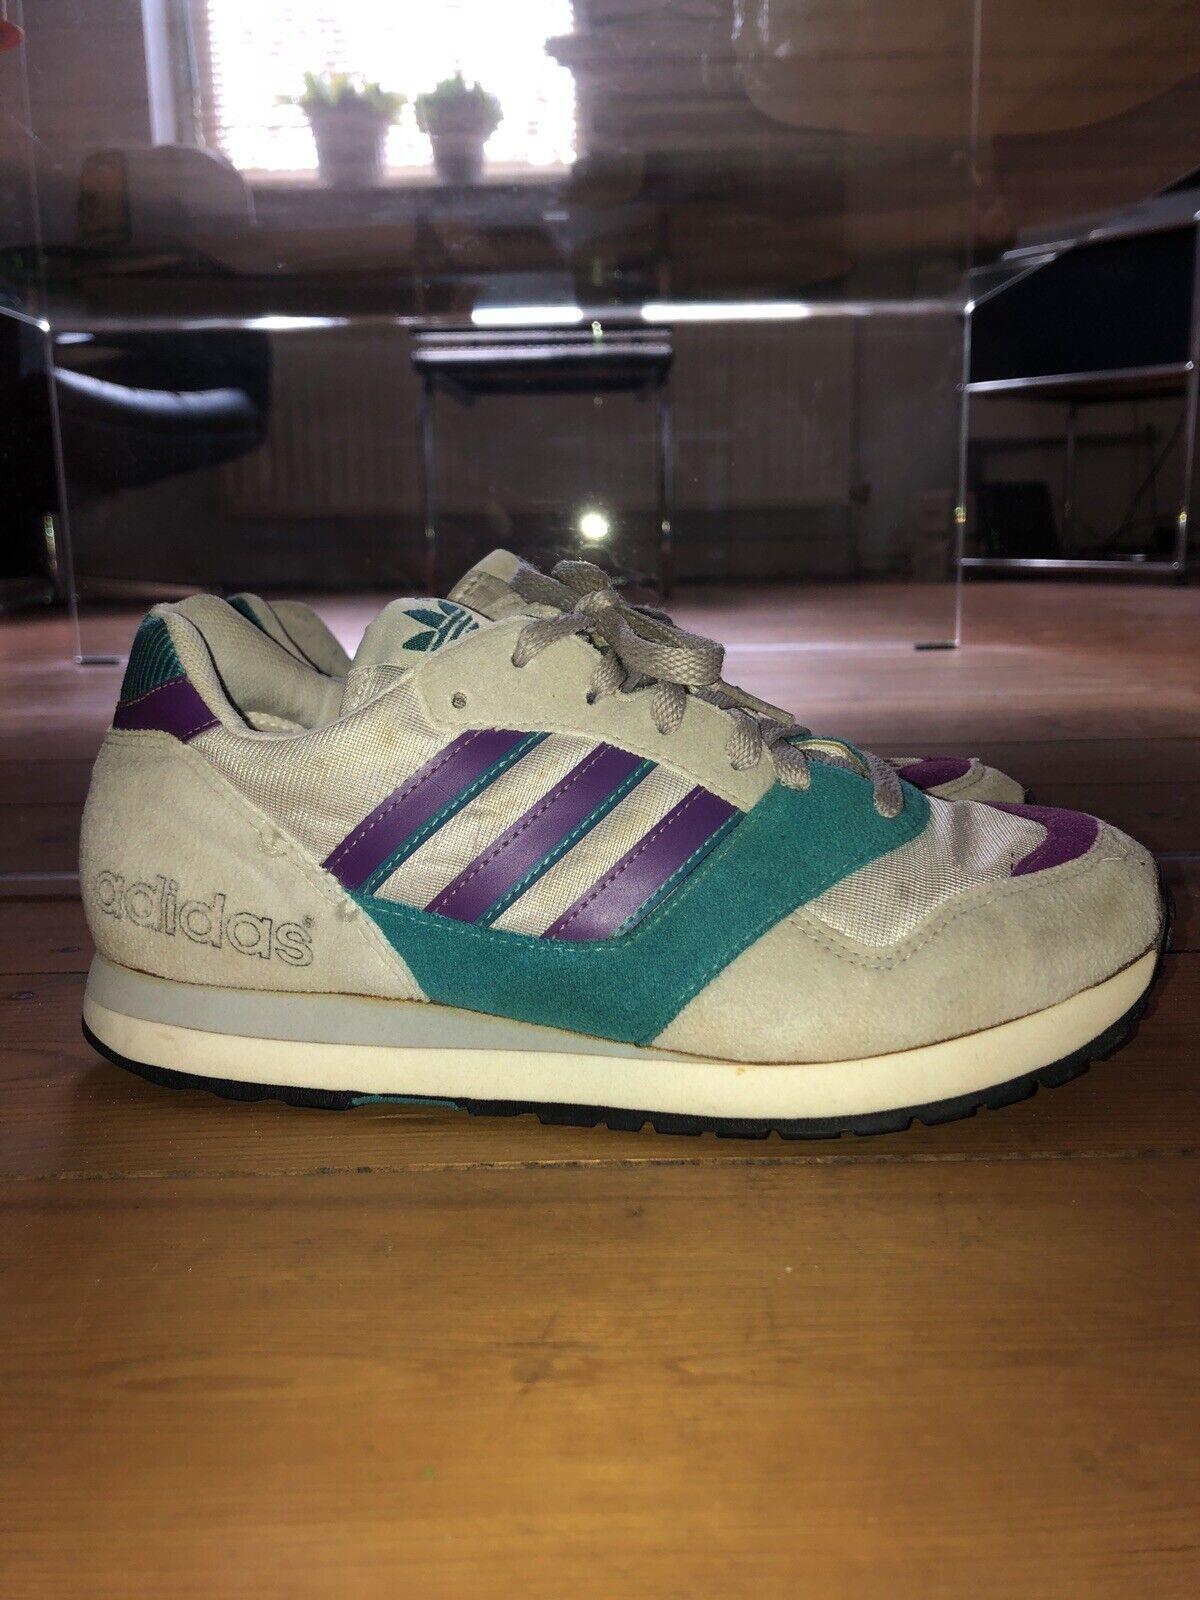 Vintage Adidas Quasar Size 39 1 3 UK 6 Size Good Condition 1991